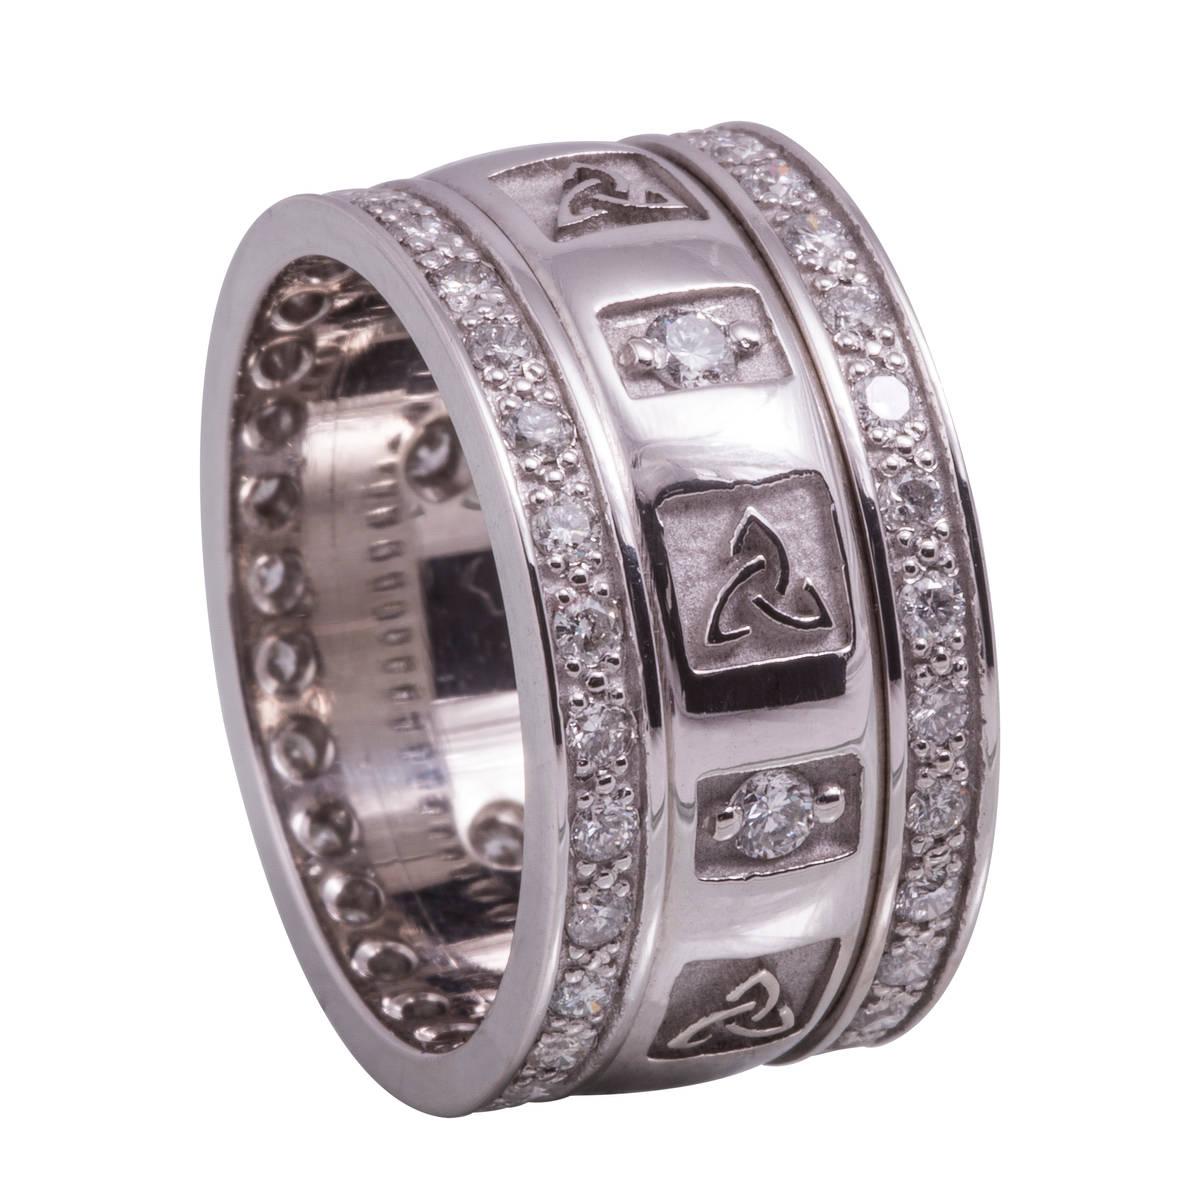 14 carat white gold lady's raised trinity knot wedding ring with 0.75 diamonds